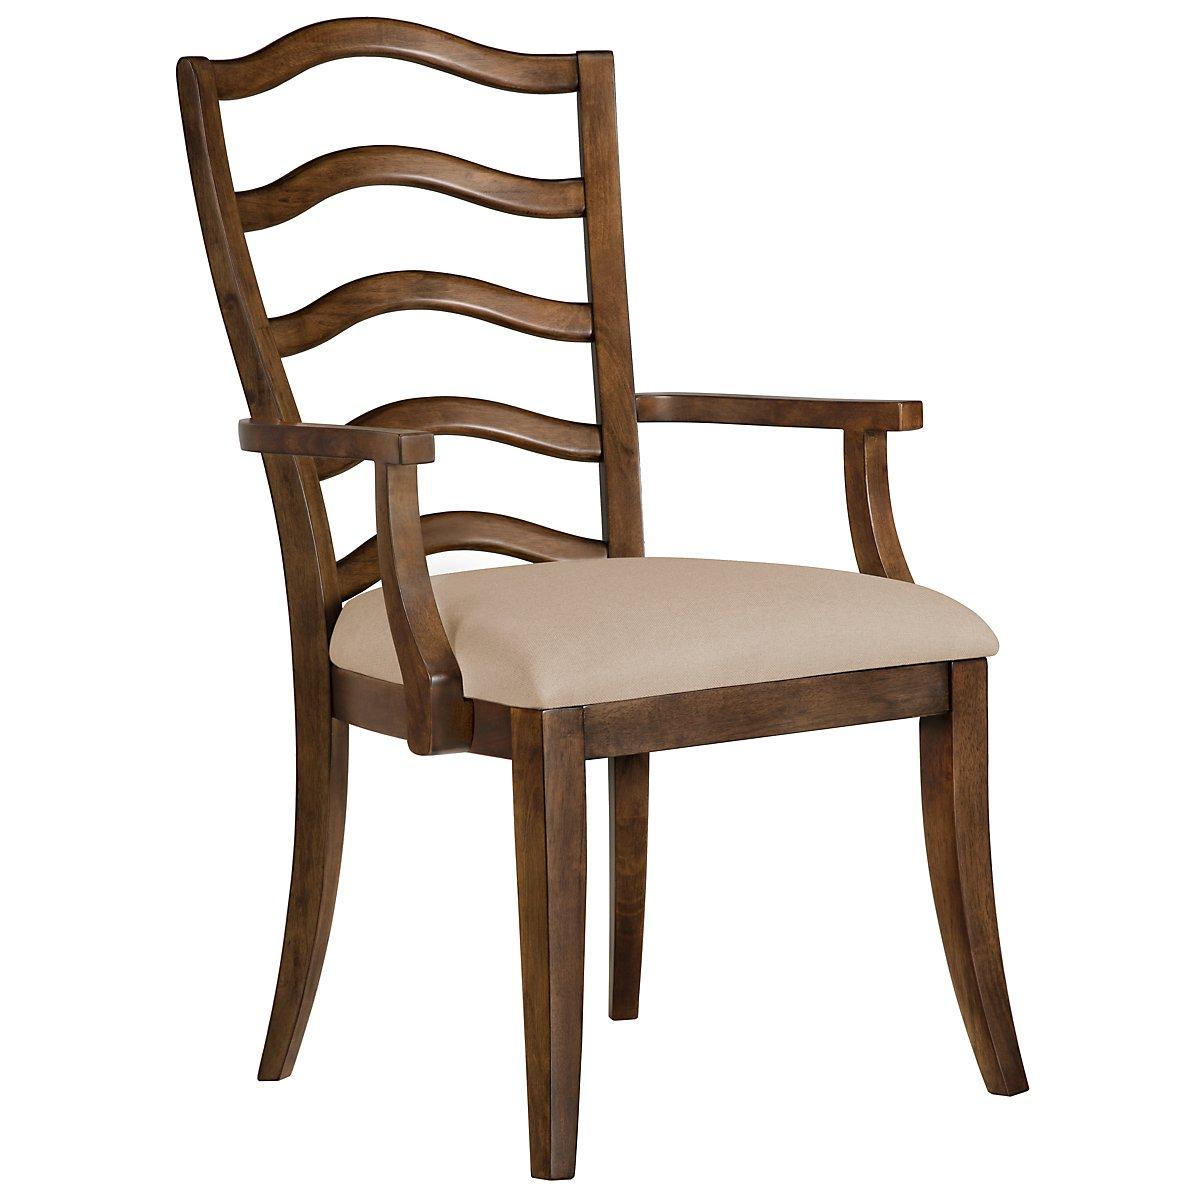 Savoy Mid Tone Wood Arm Chair